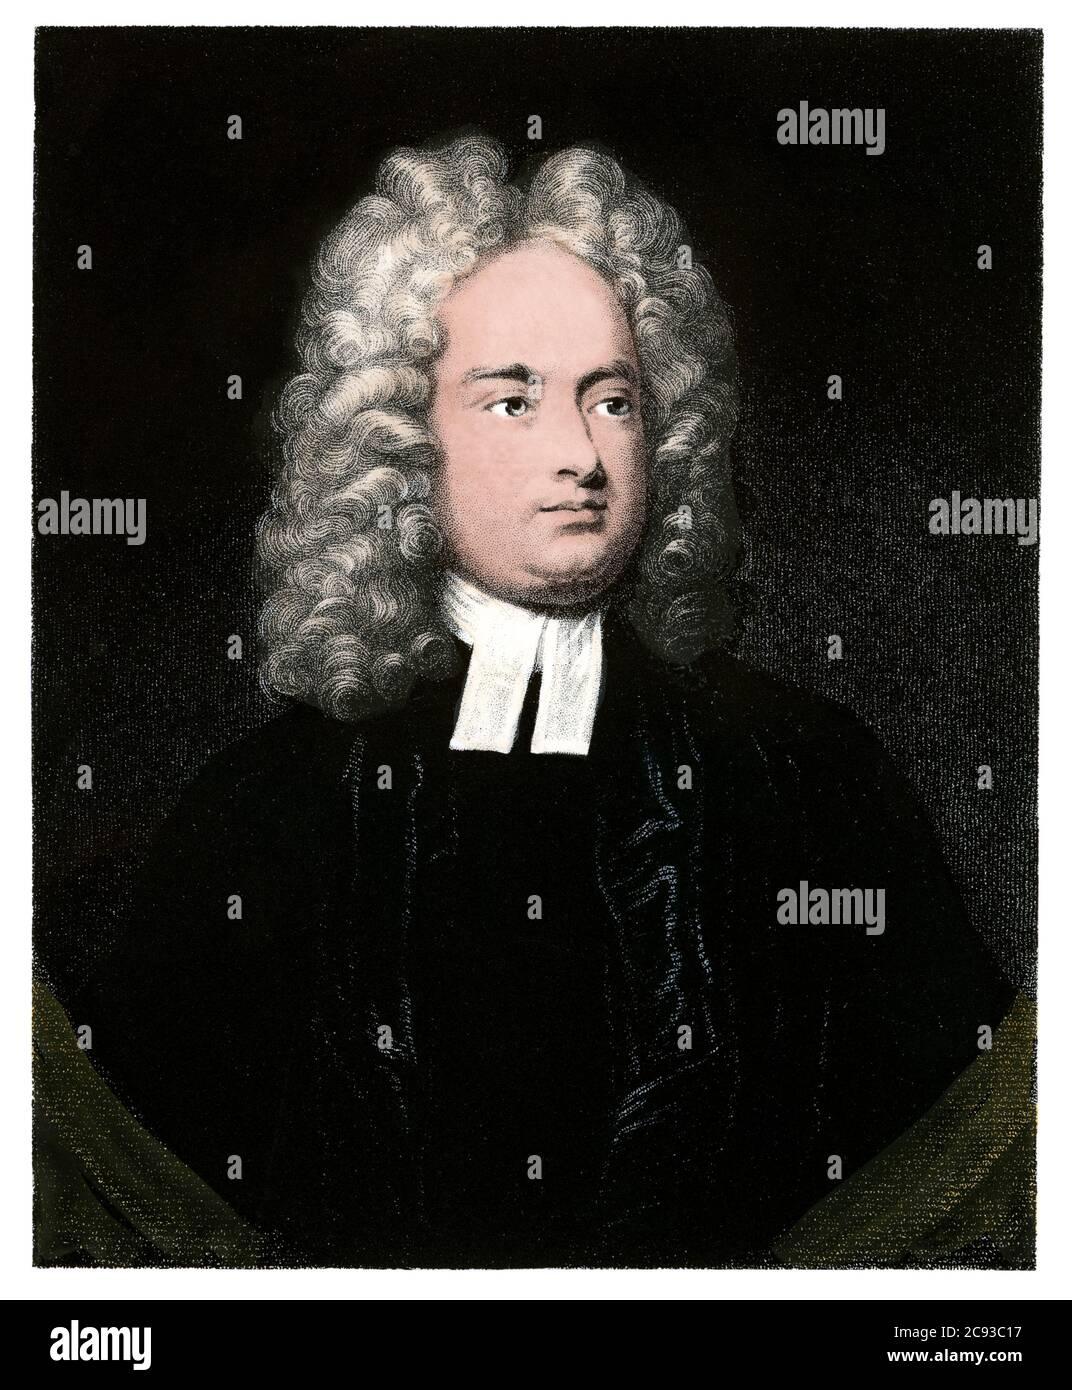 Jonathan Swift. Hand-colored engraving Stock Photo